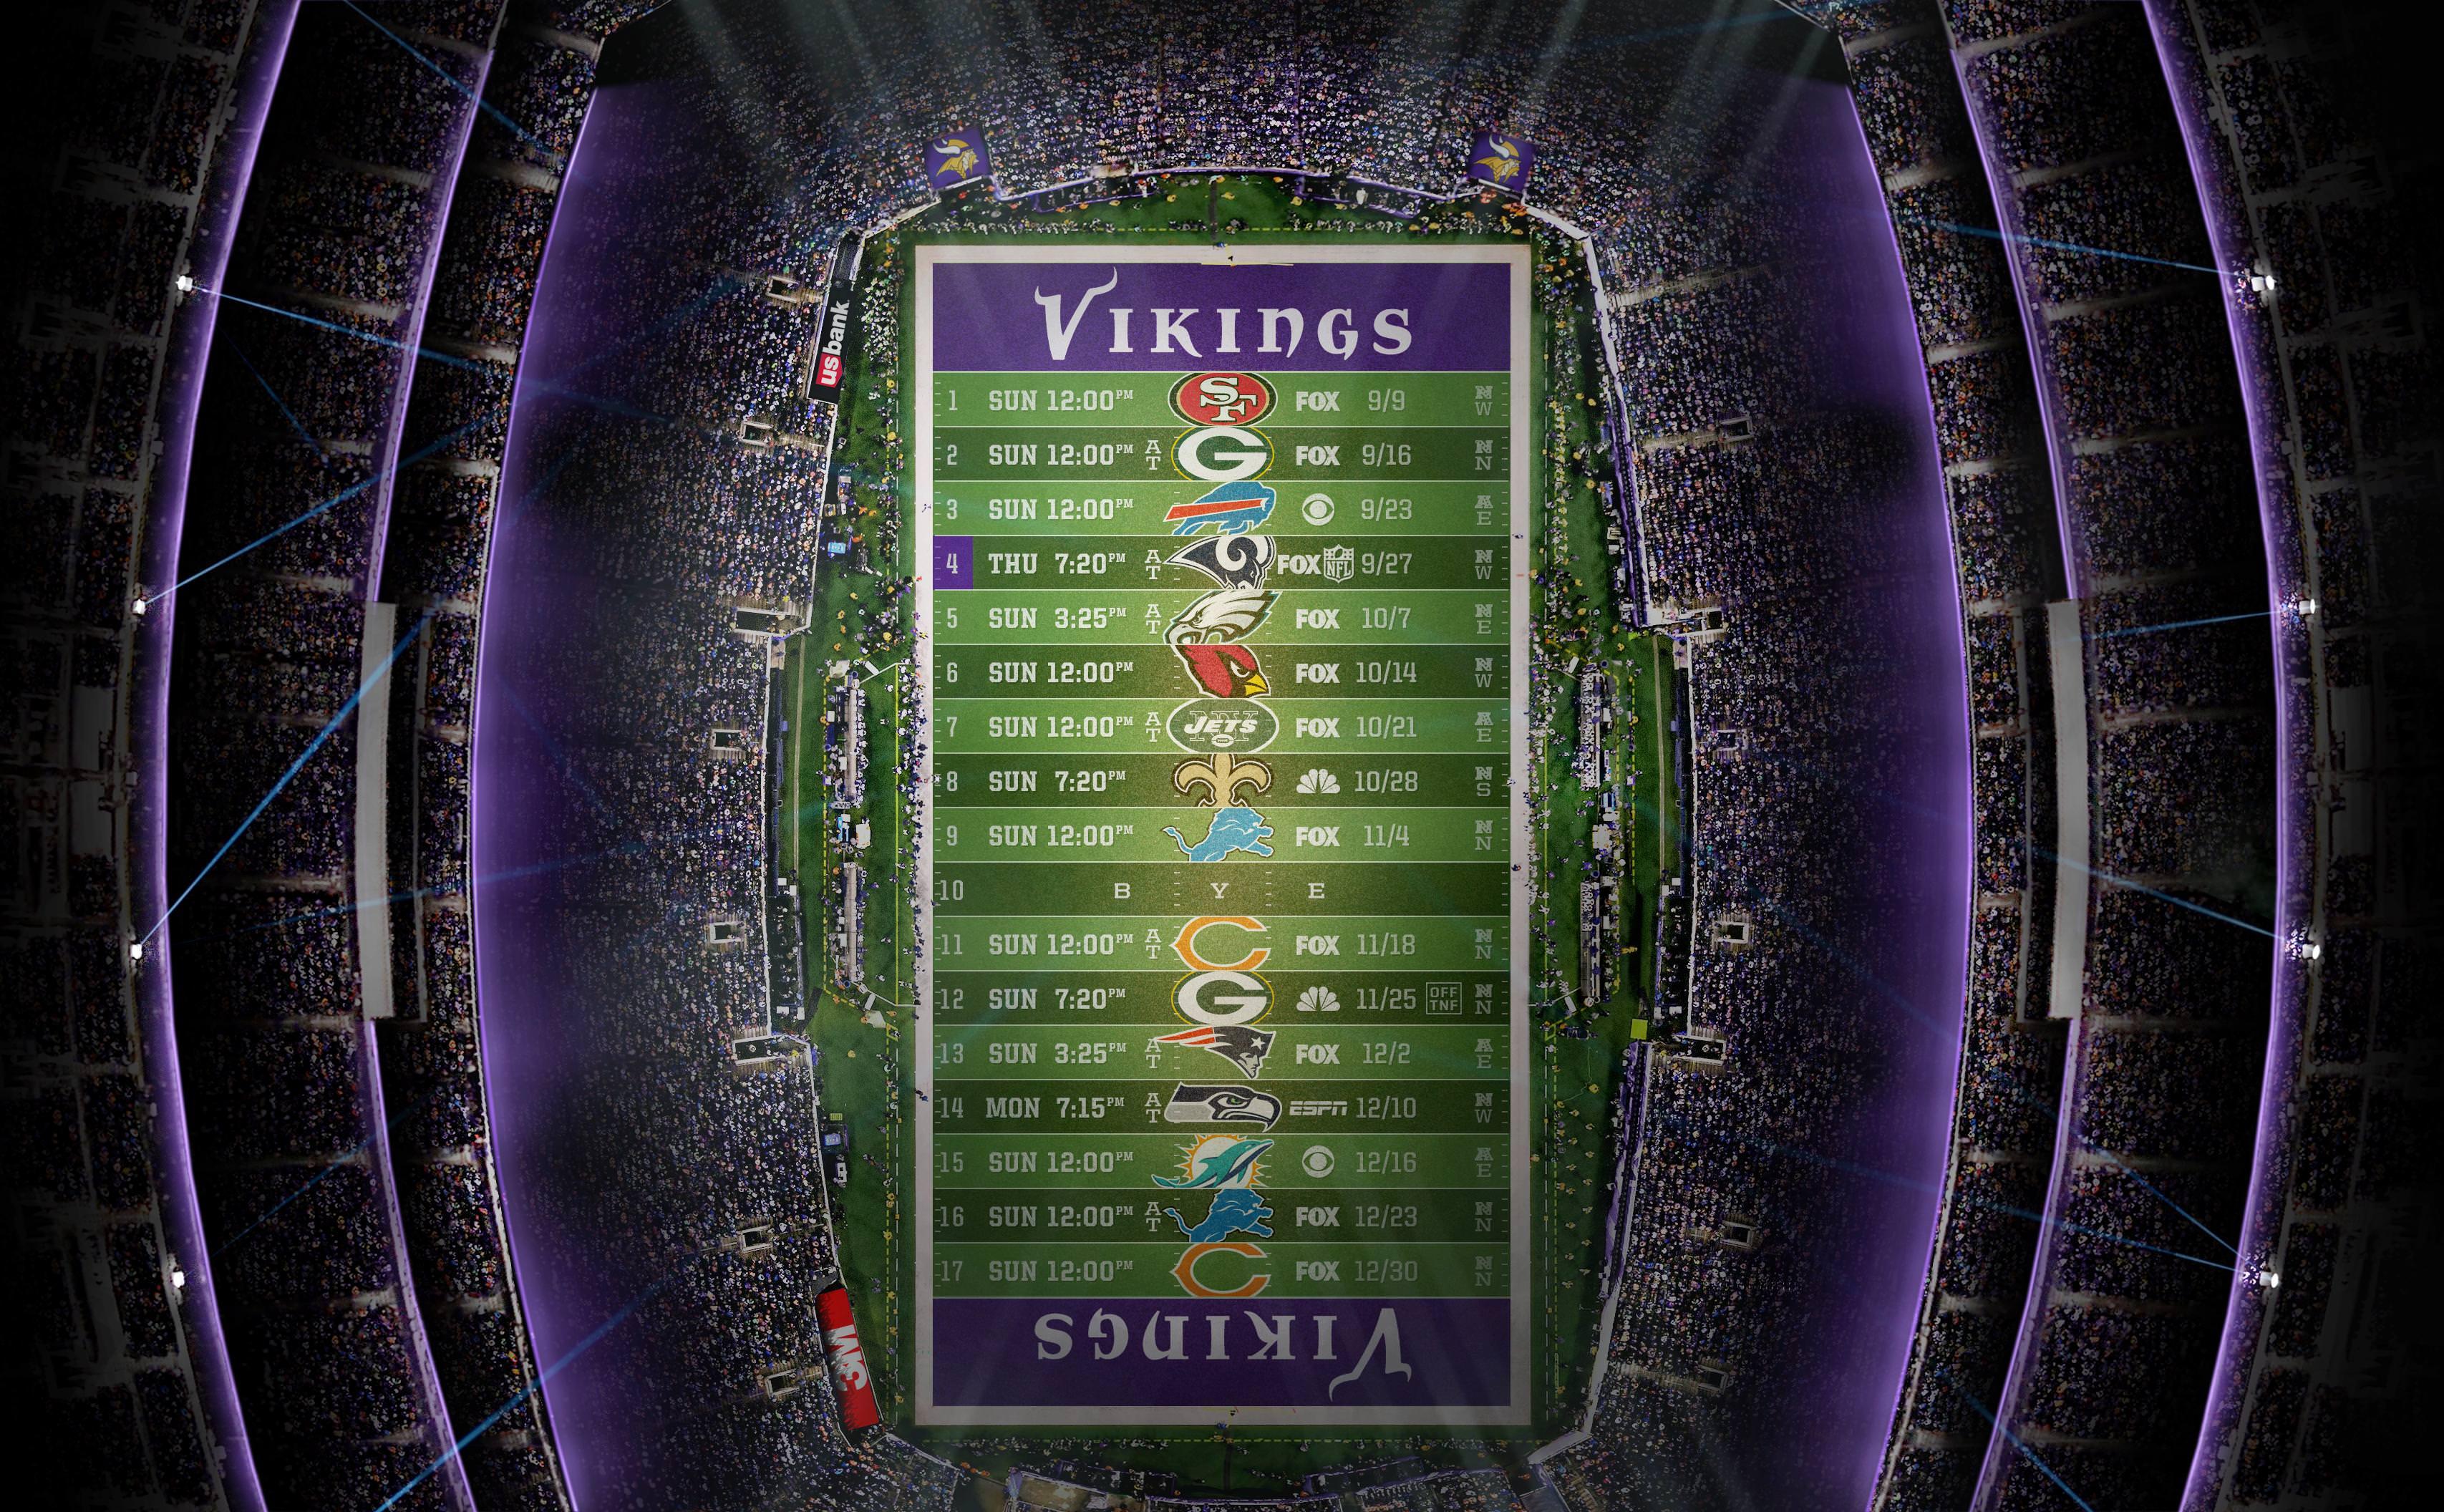 2018 Minnesota Vikings Stadium Schedule Wallpaper minnesotavikings 3414x2112